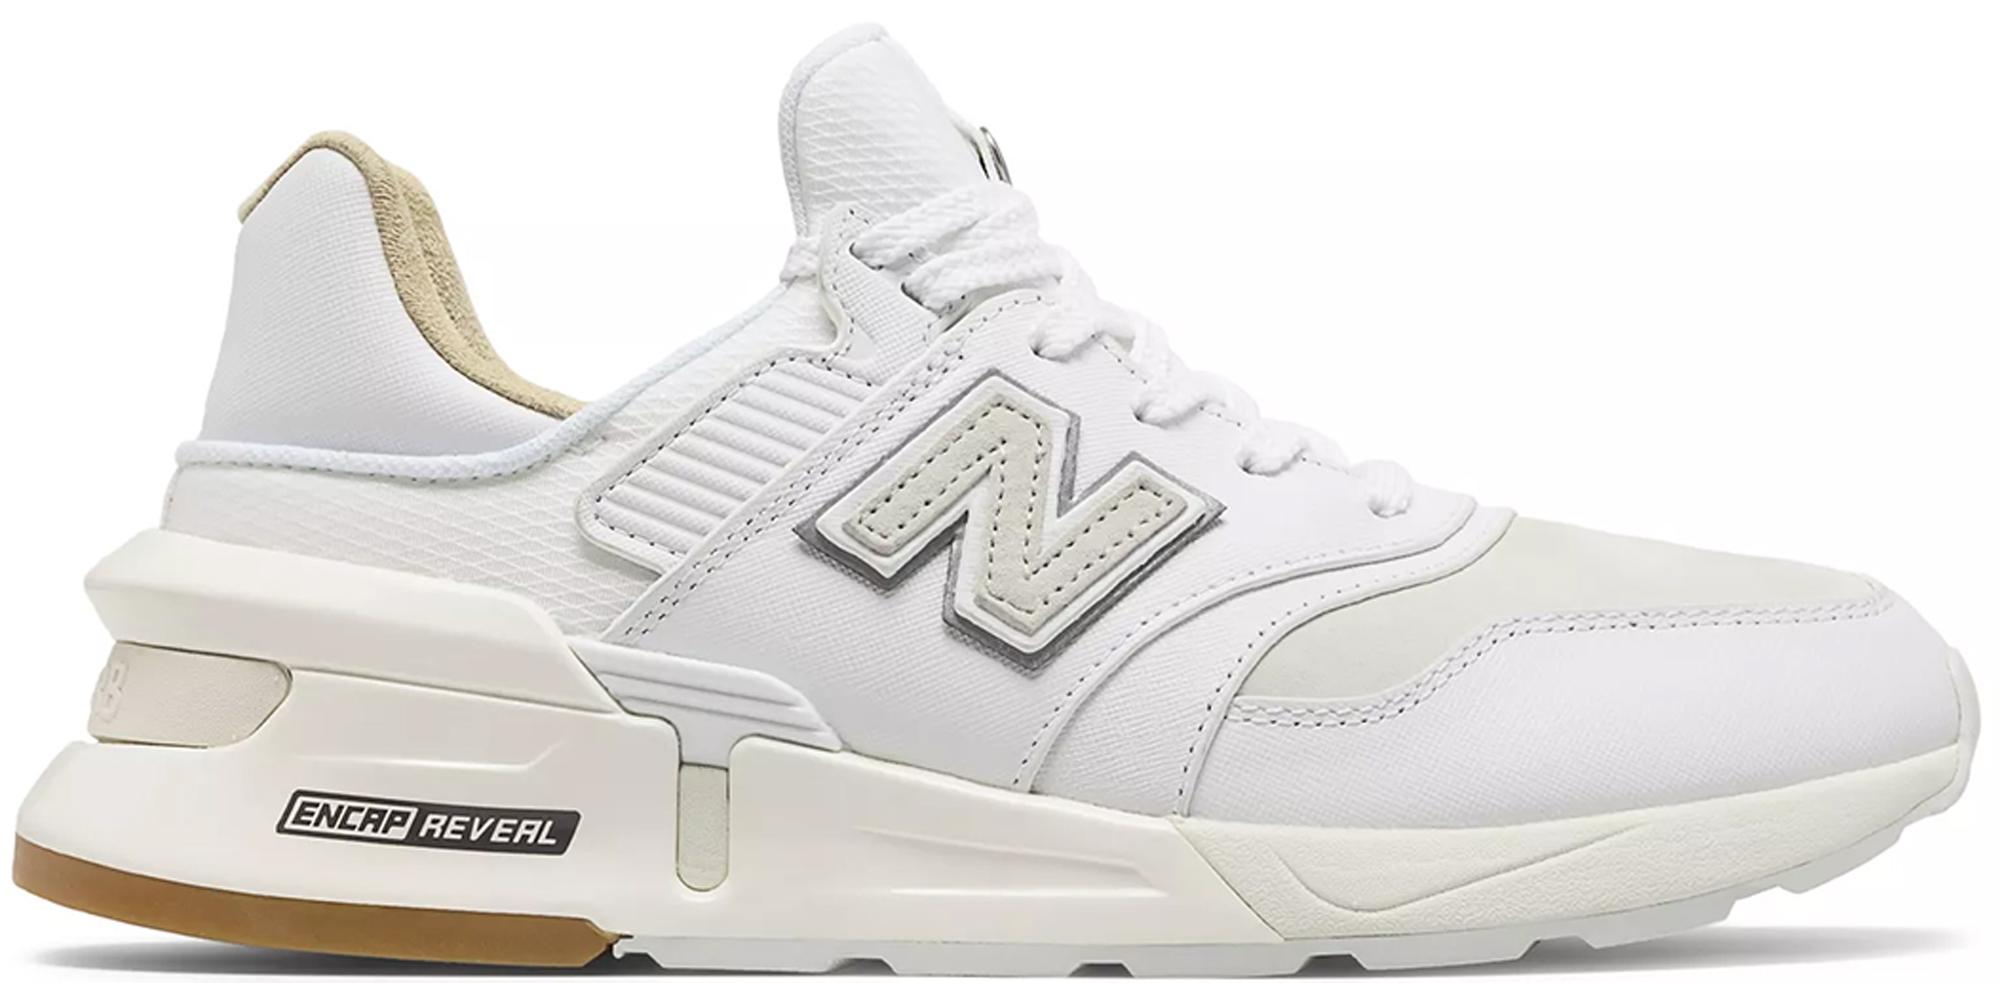 New Balance 997S Saffiano Leather White